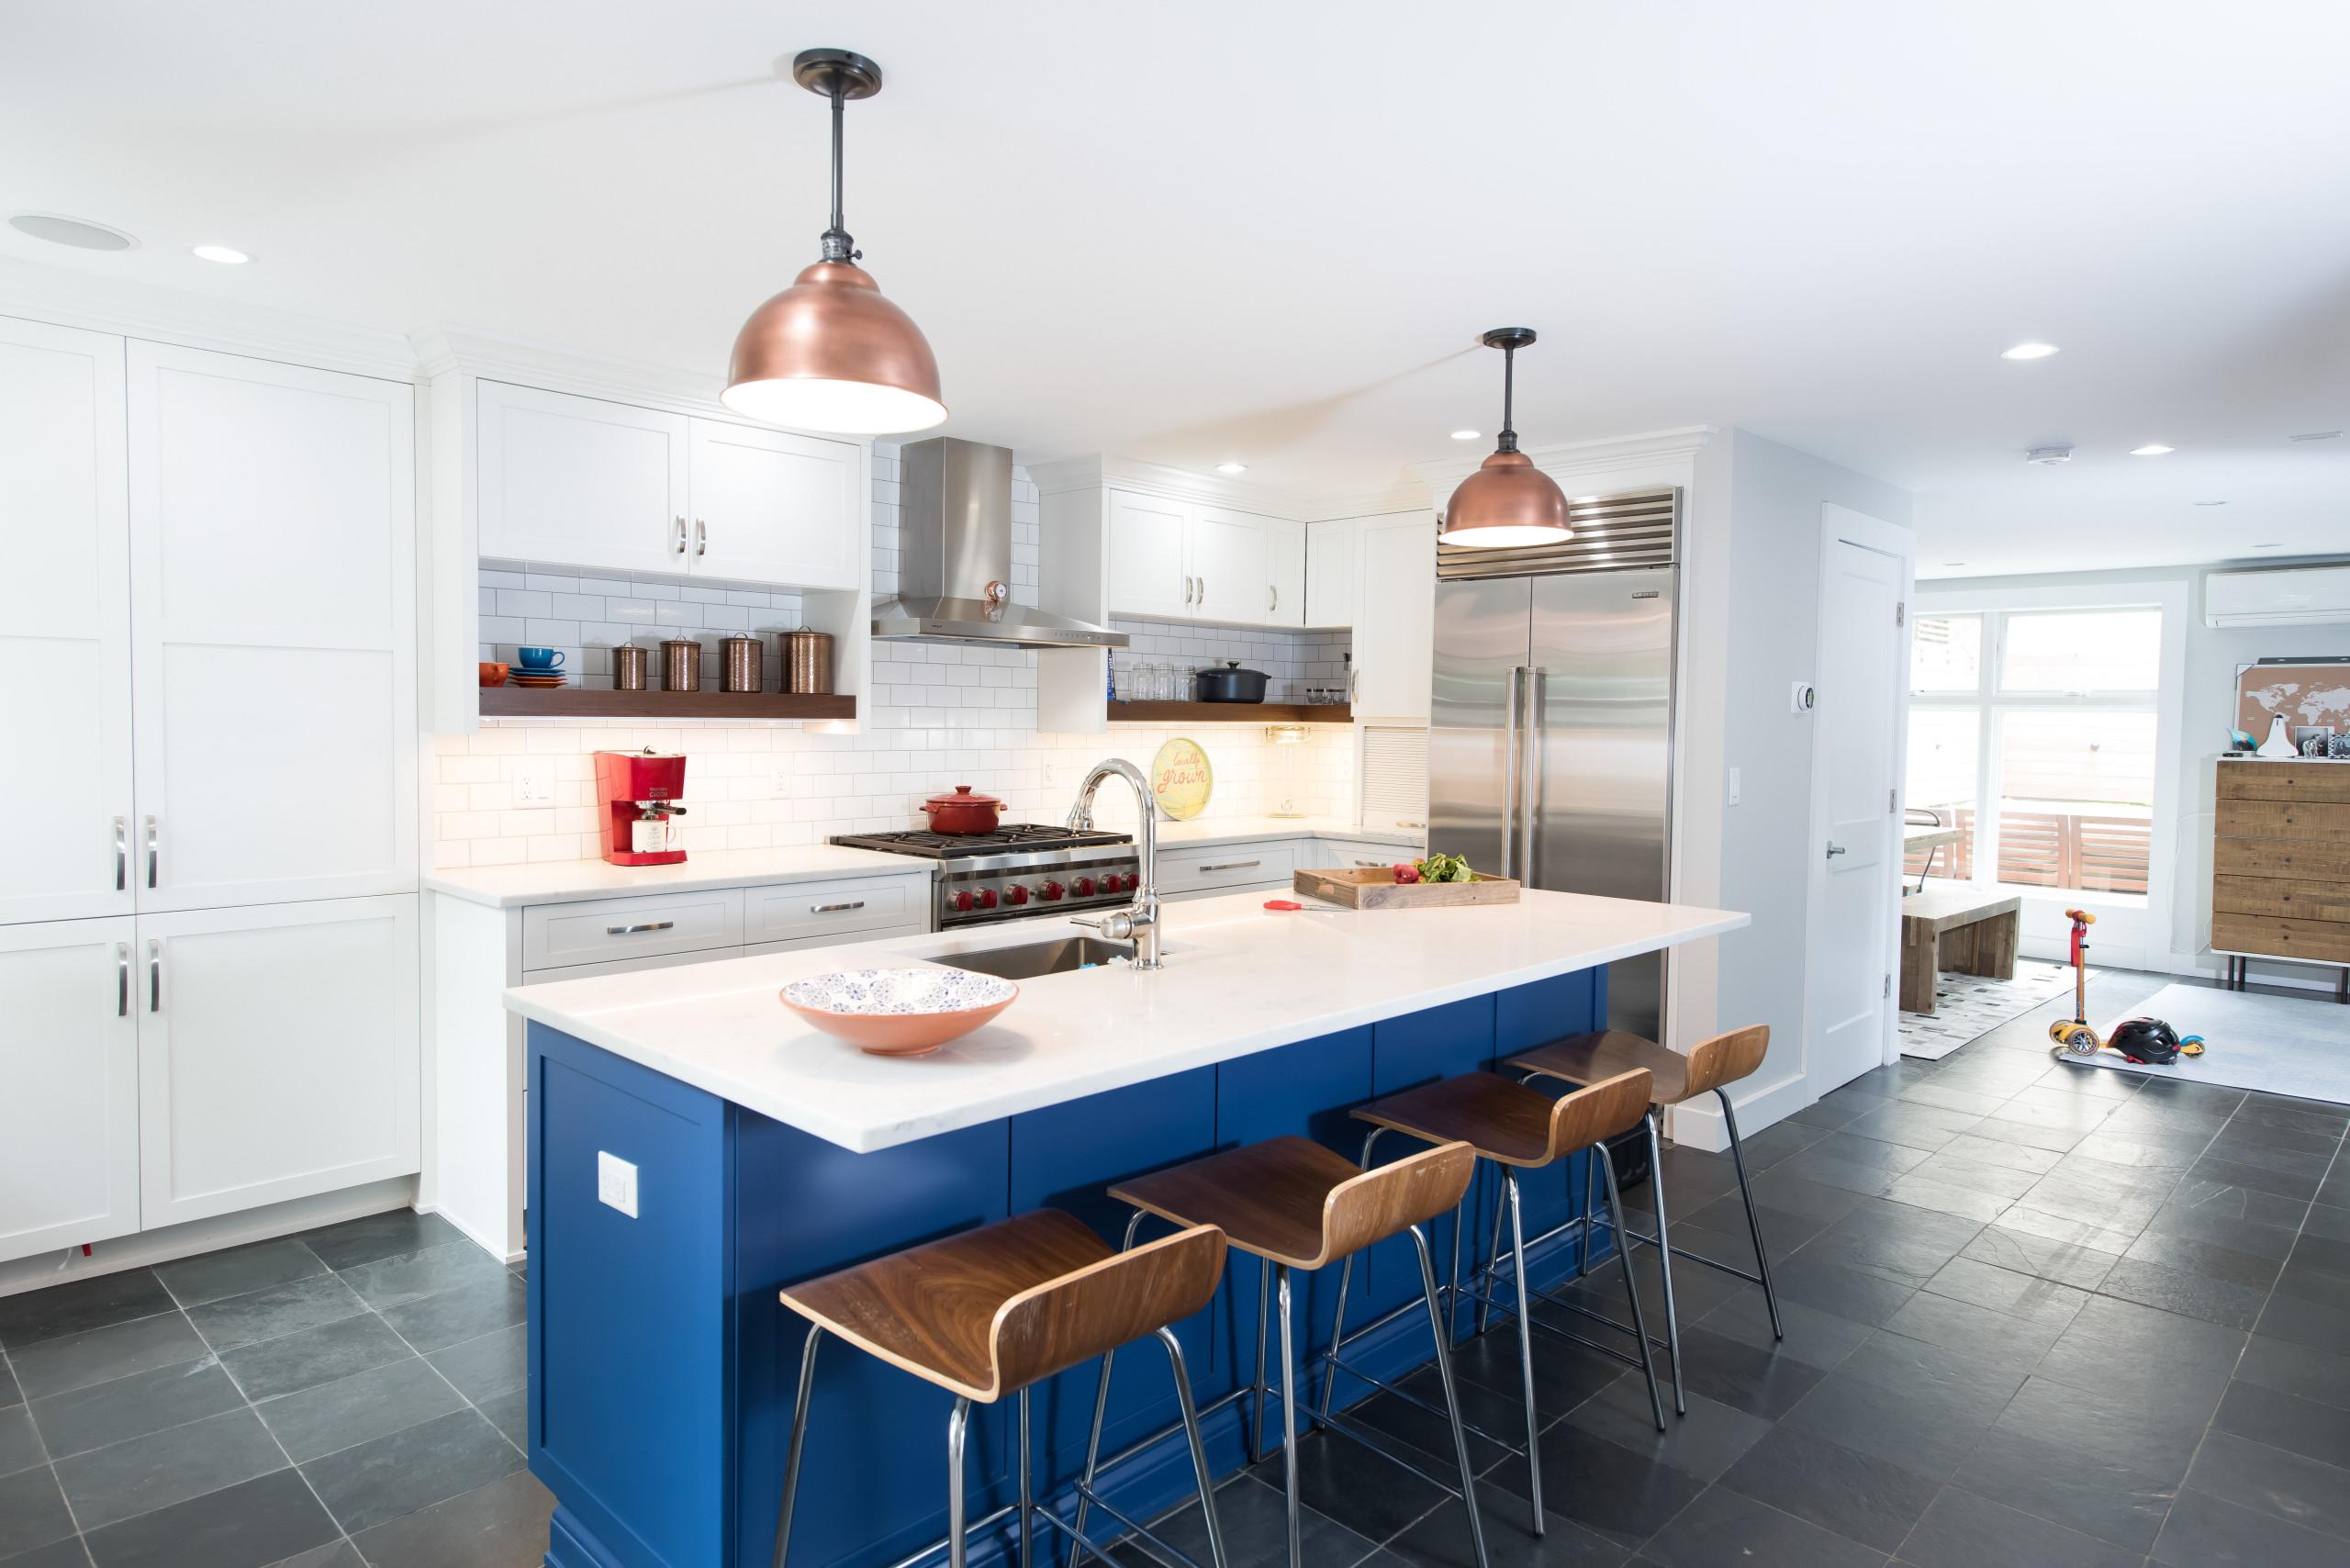 Park Avenue Hoboken - Kitchen Remodel